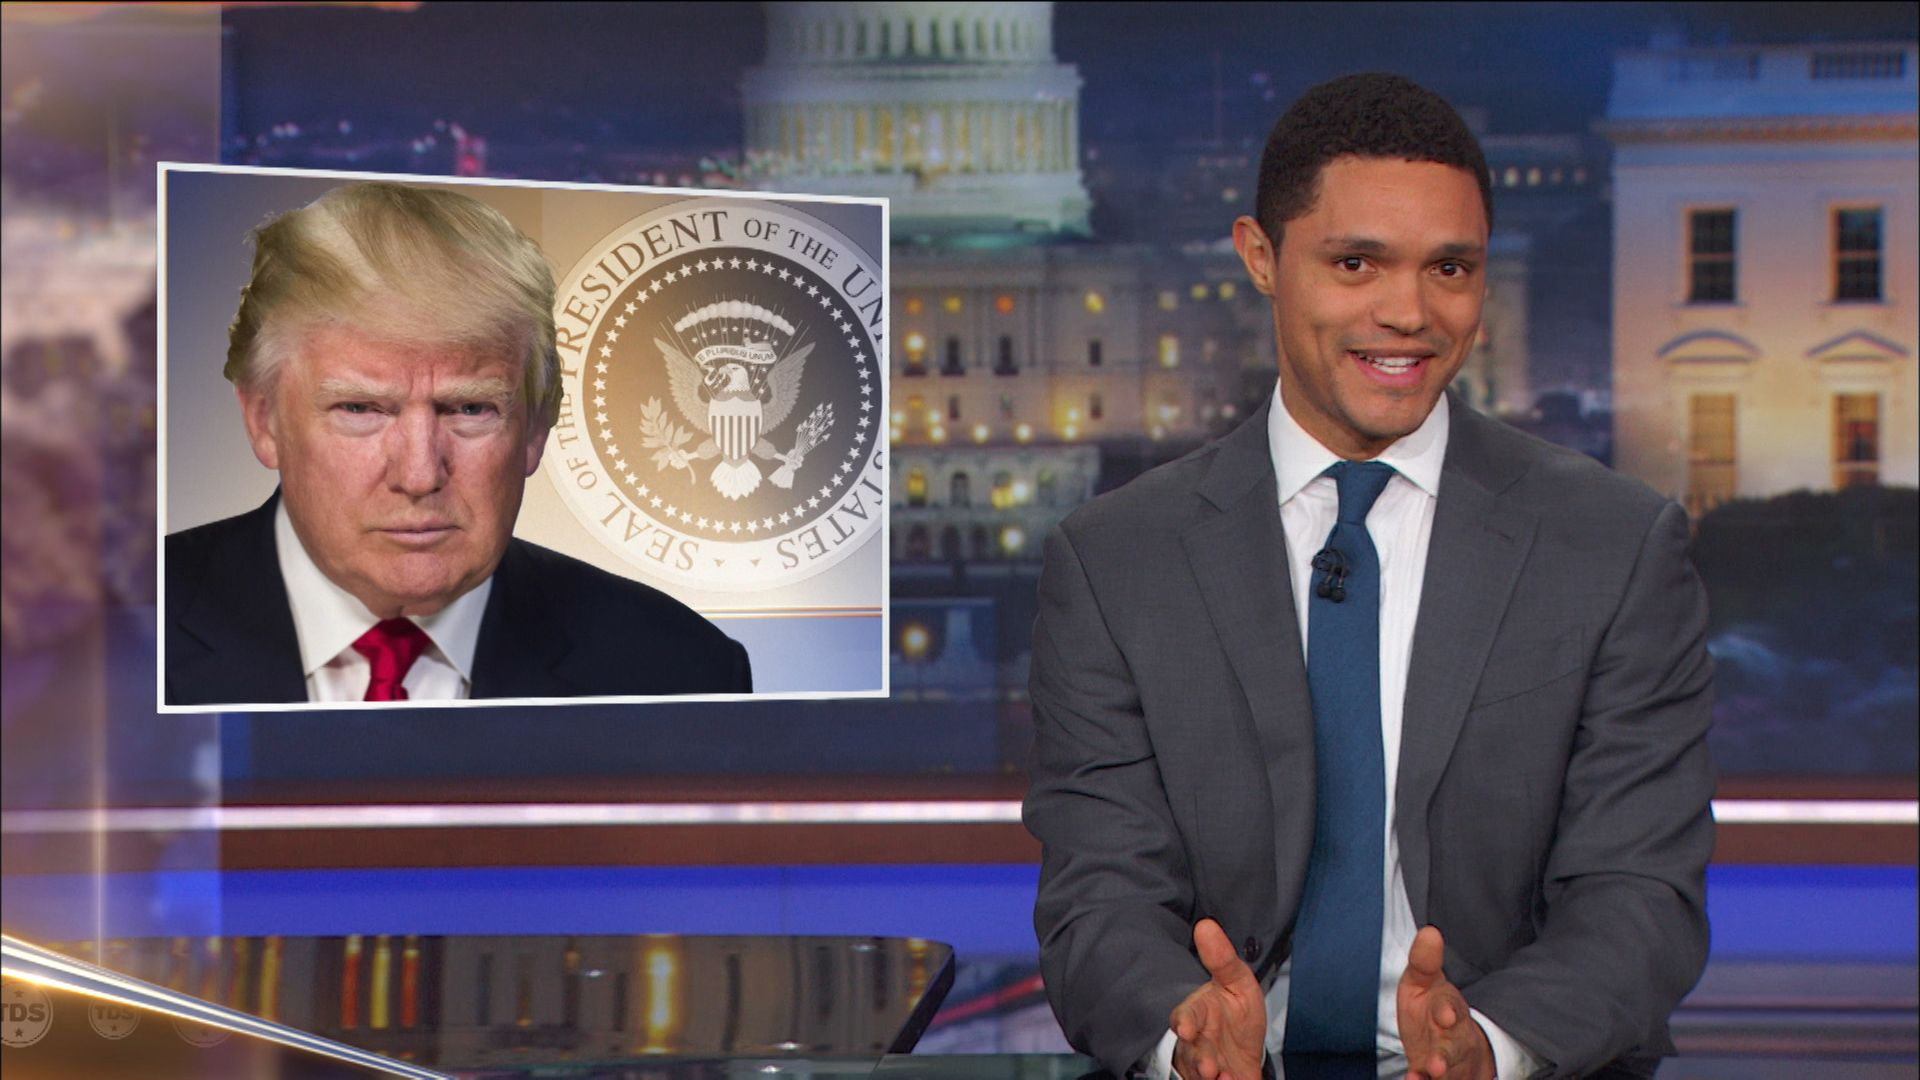 The Daily Show with Trevor Noah - January 16, 2018 - Ricky Martin | Comedy Central